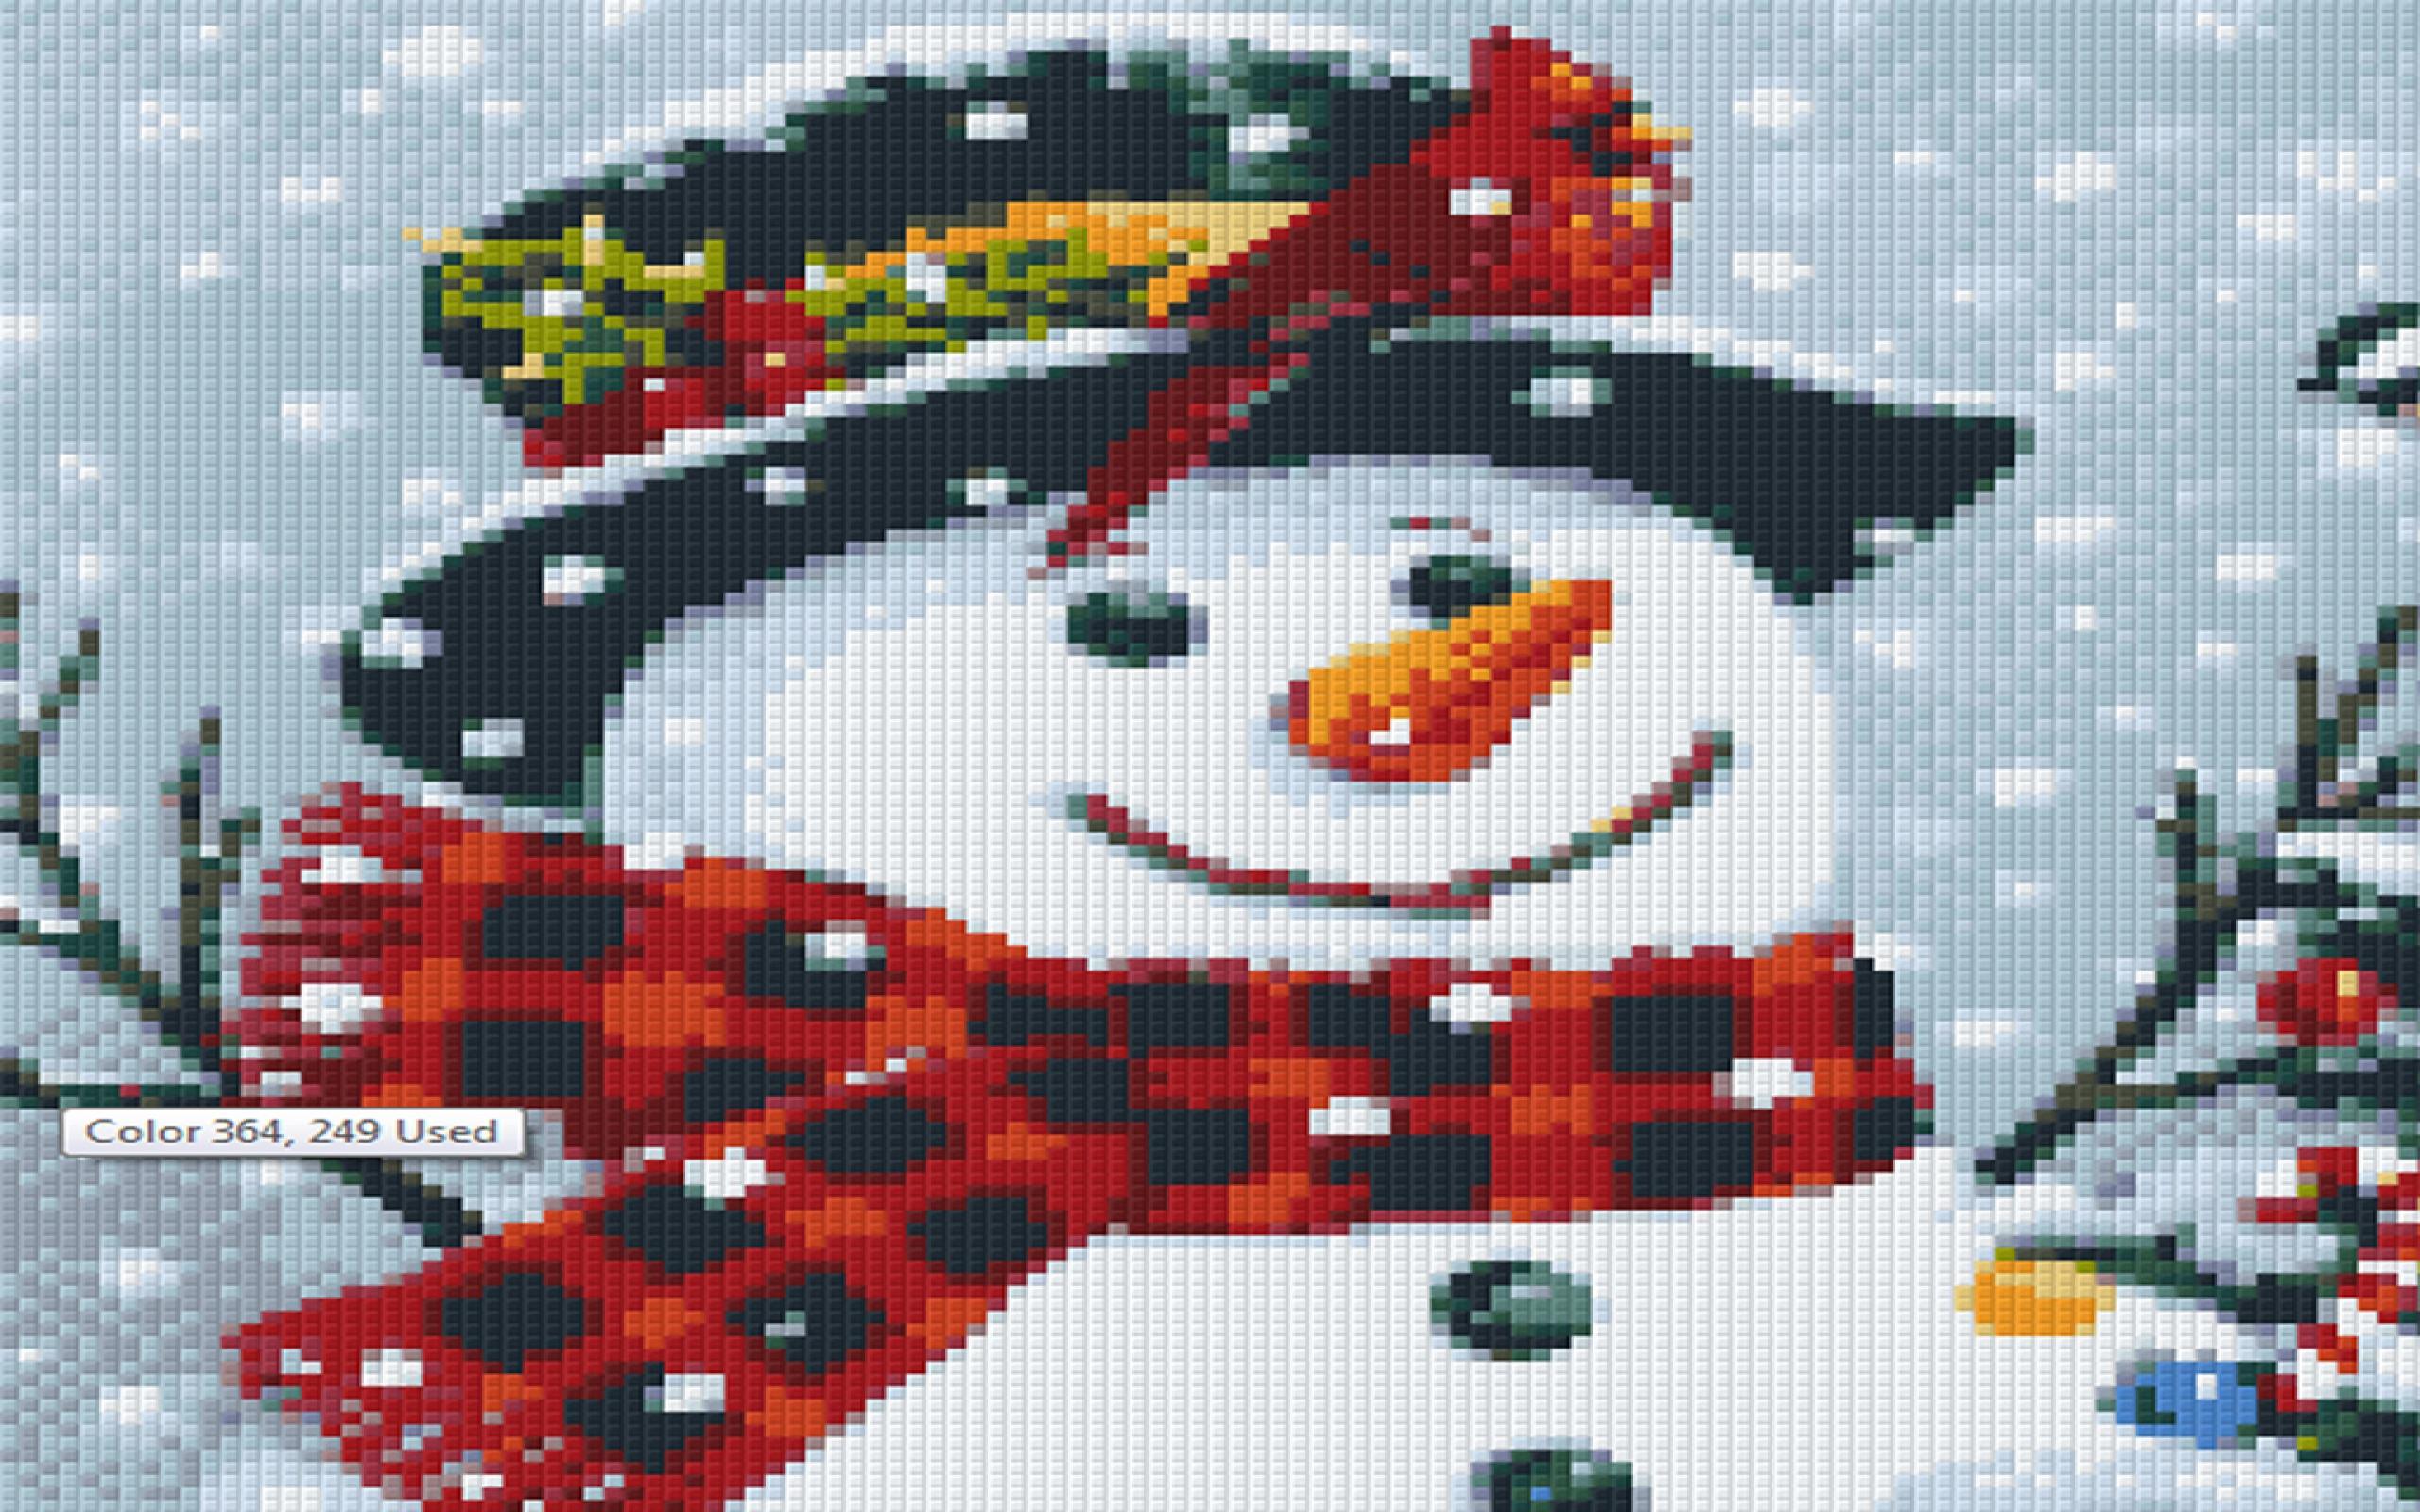 Country Snowman Desktop Wallpaper 2560x1600 px 3QC89Q6 2560x1600